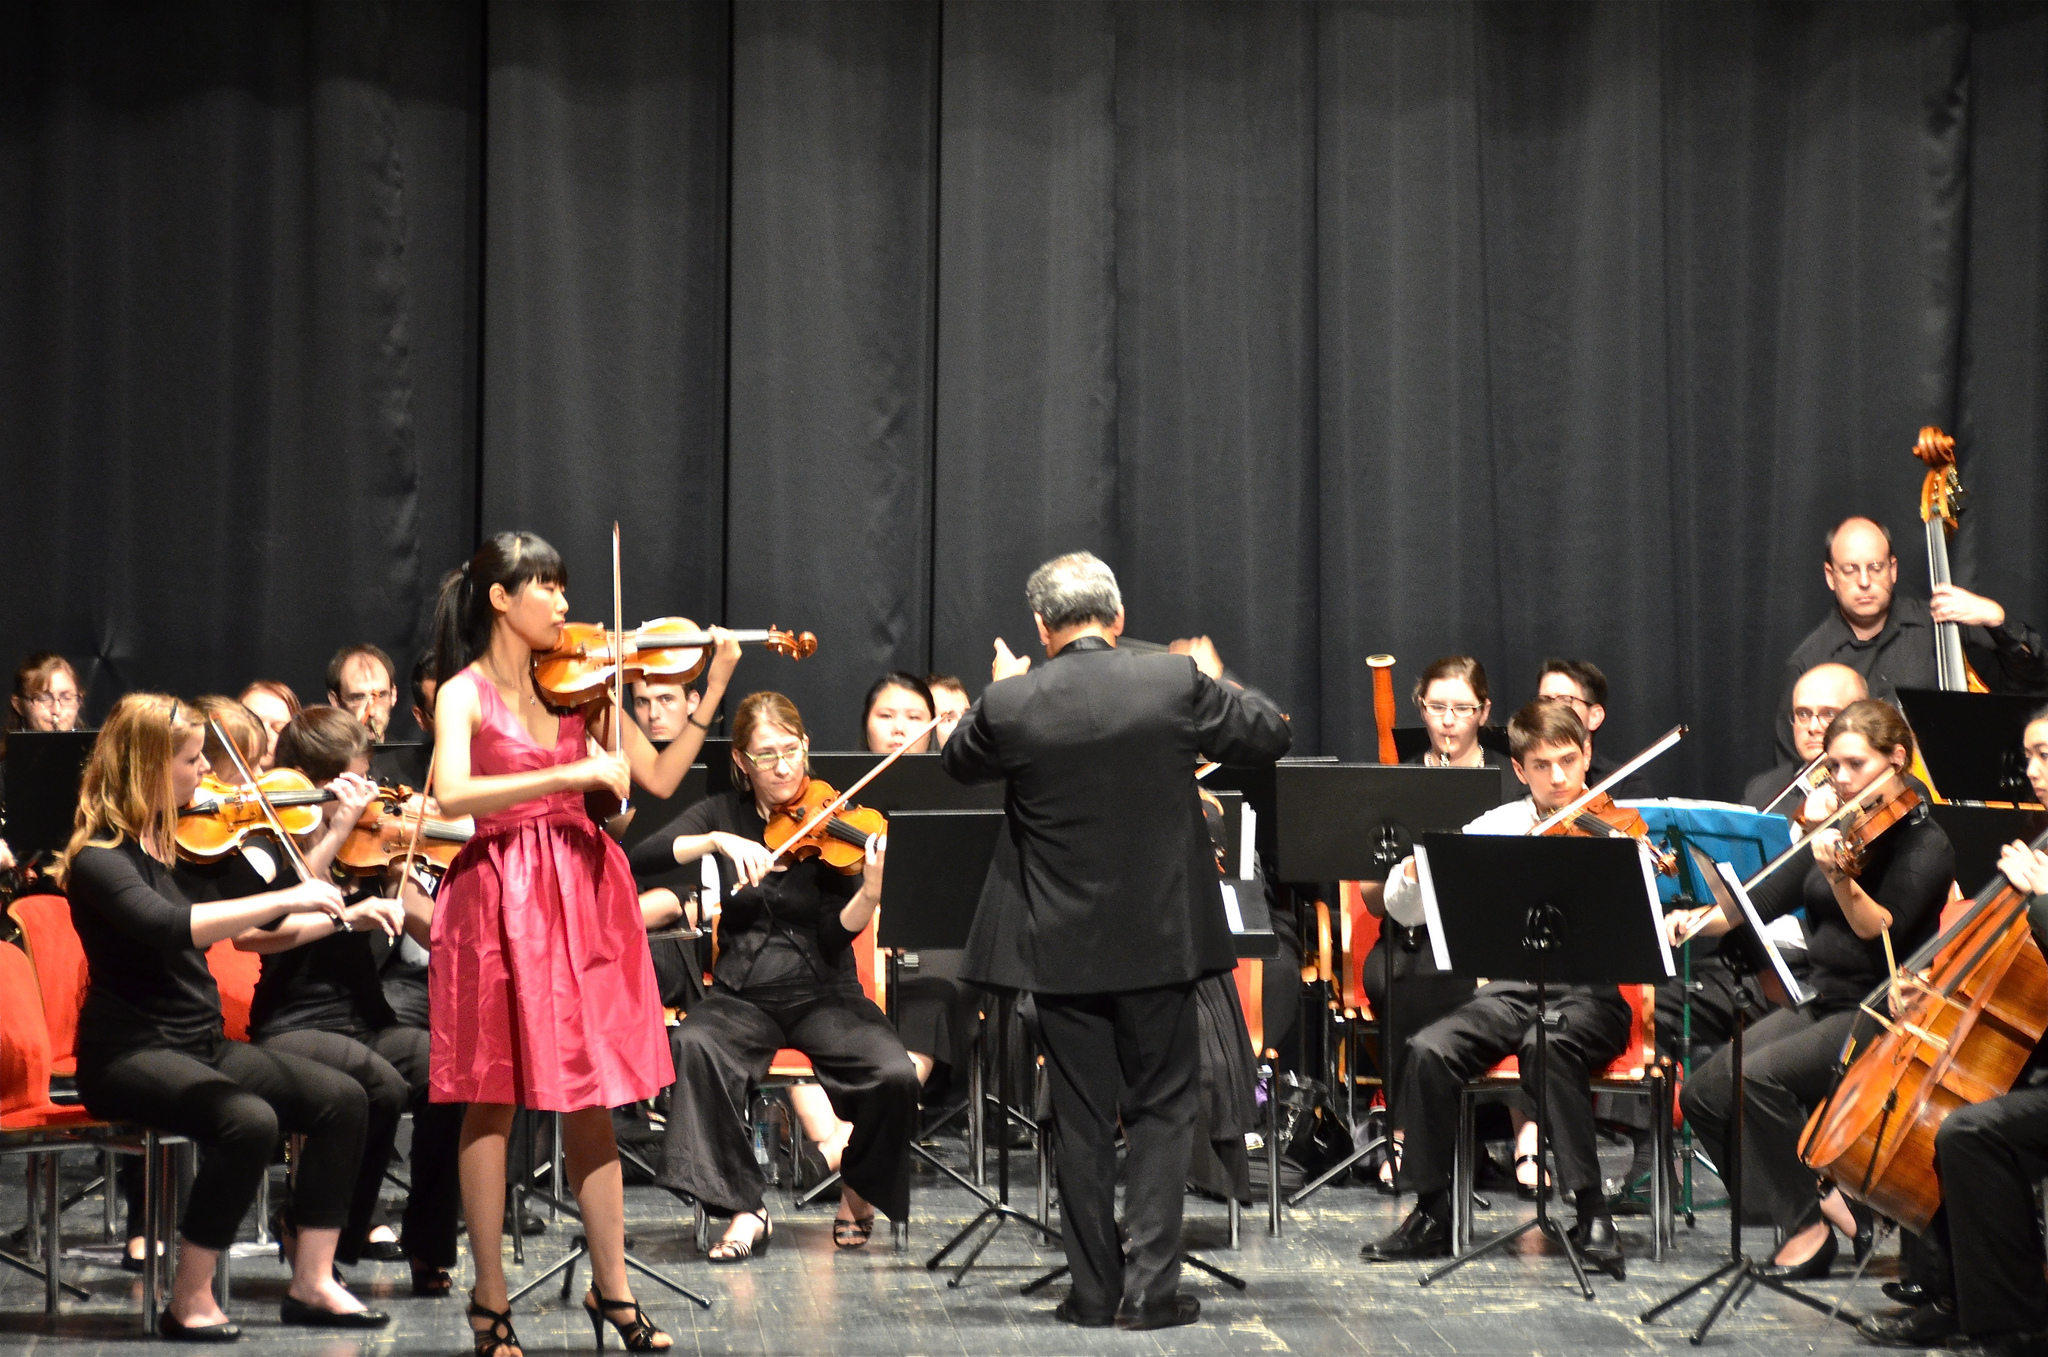 OrfeoConcertoComp'12WinnerShuWang-MzrtCPncerto-AlvaroGomez-conductor.jpg